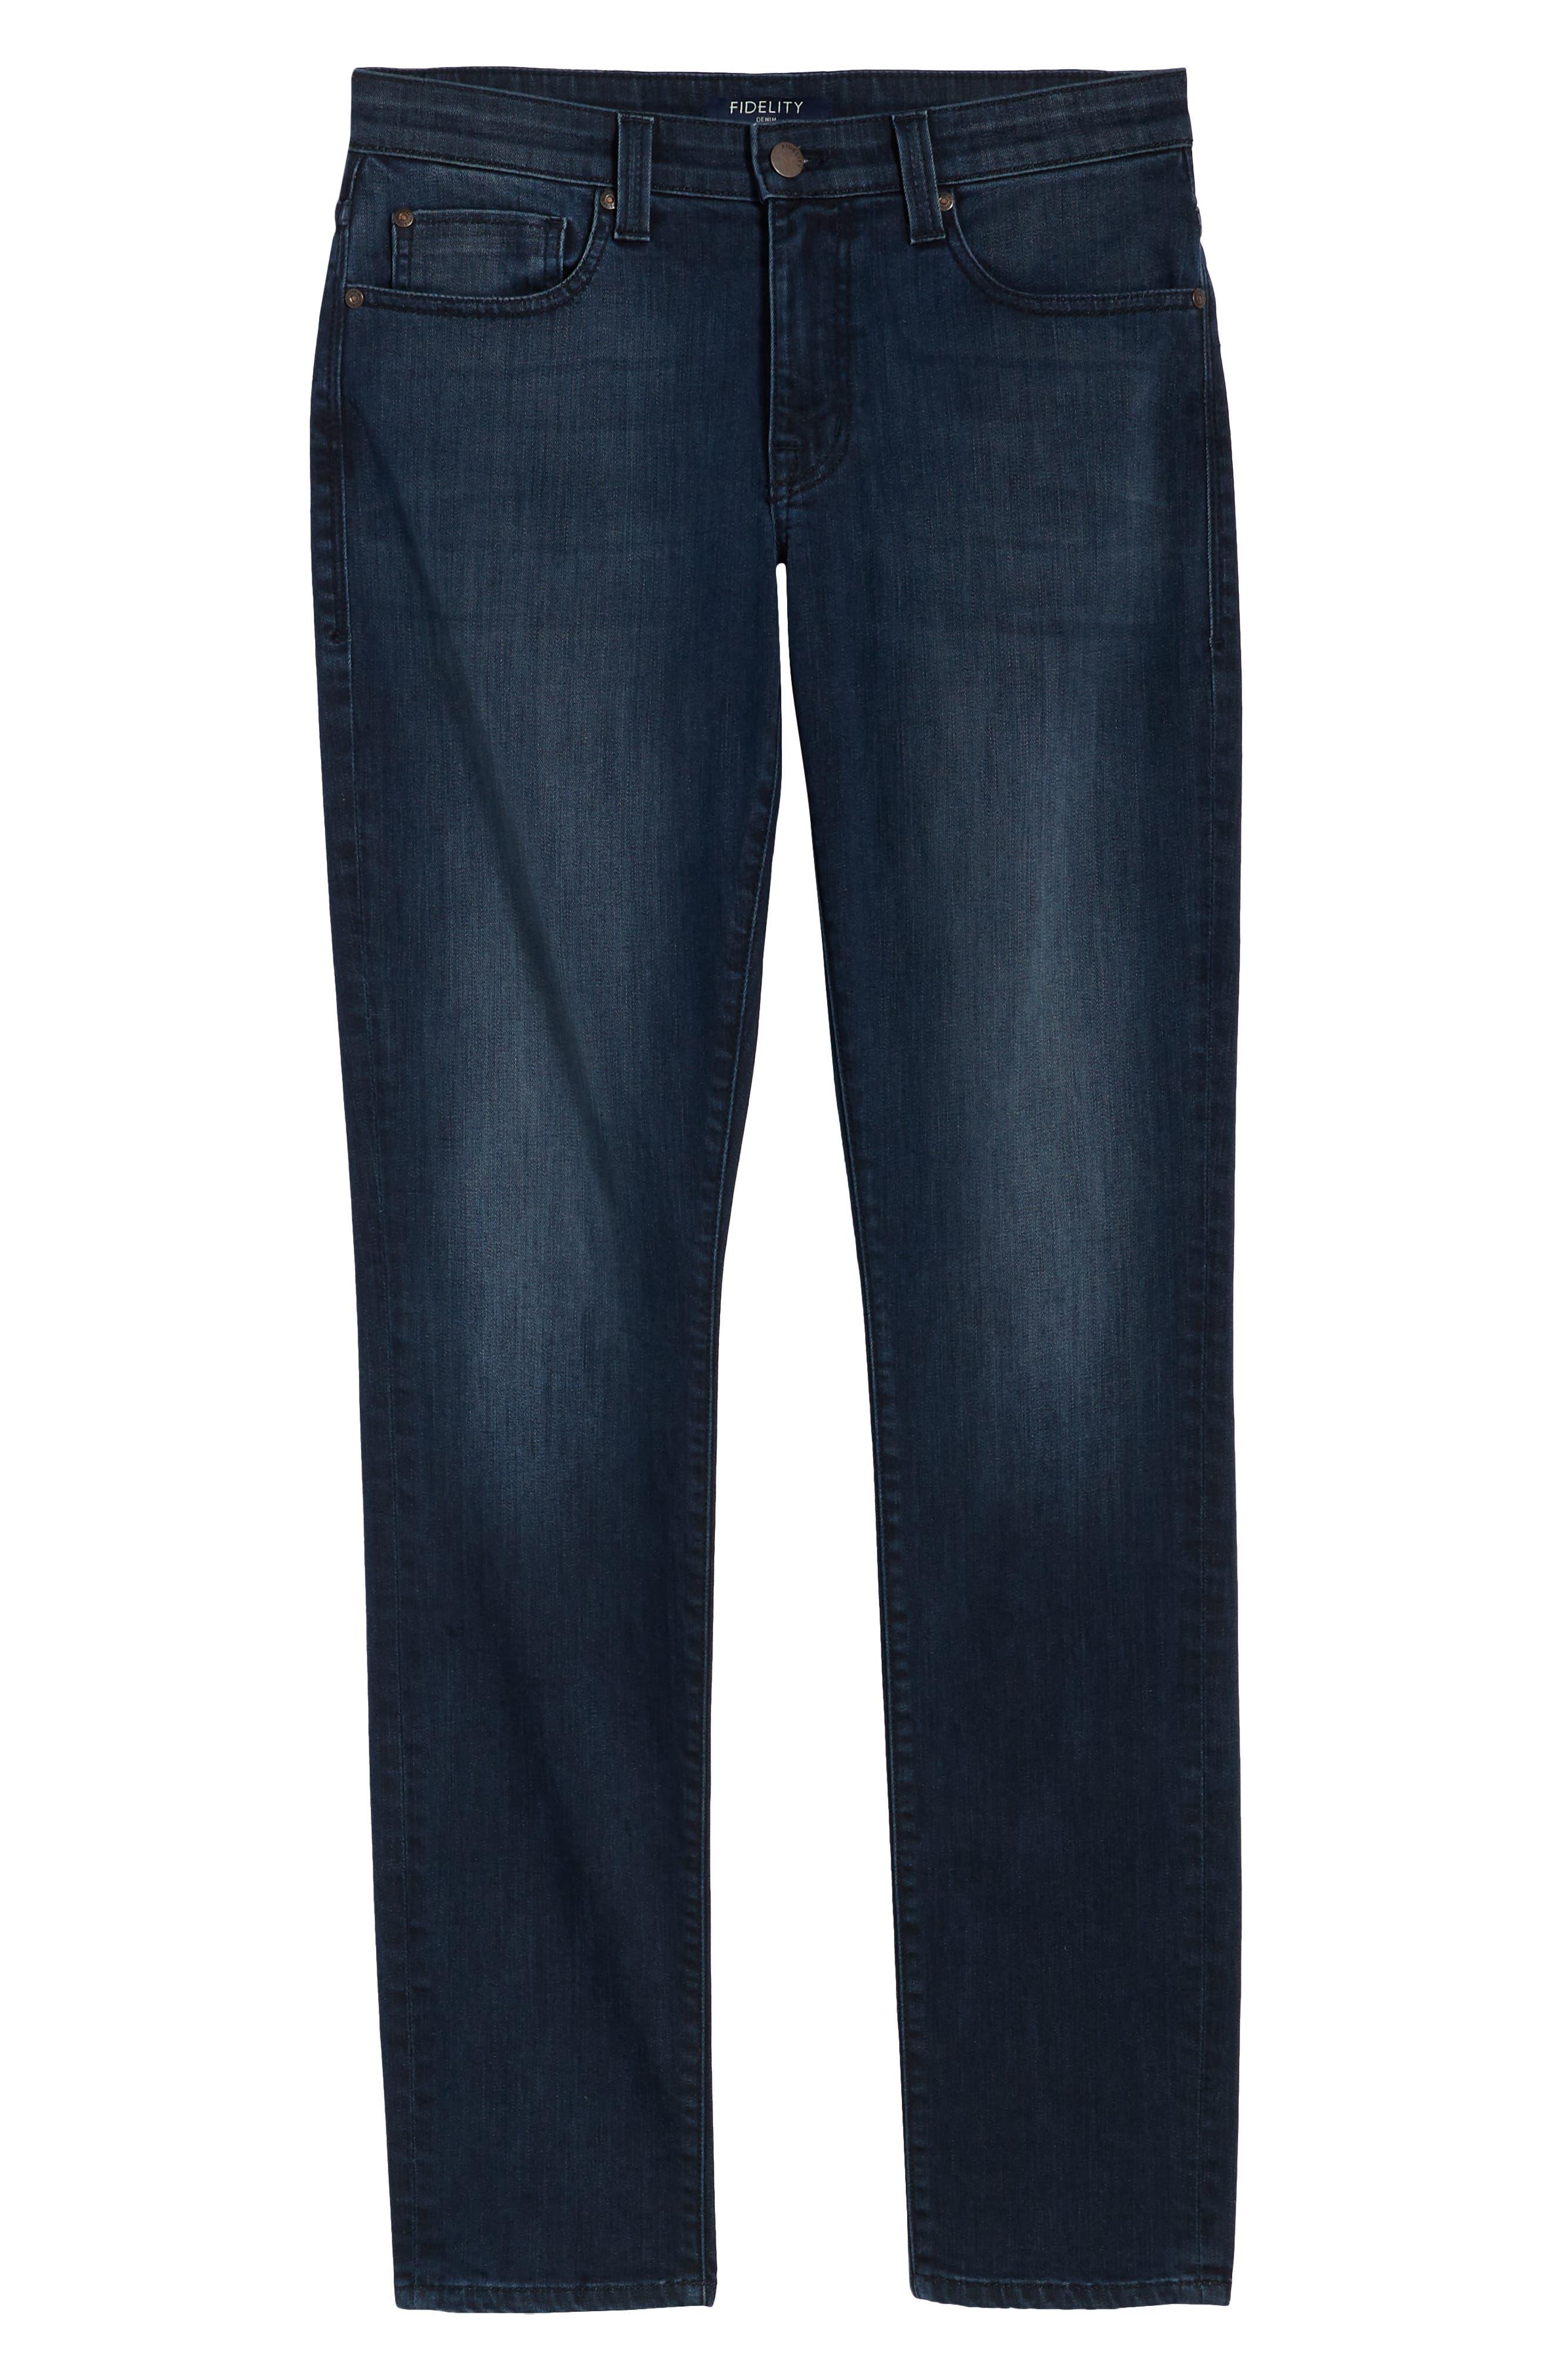 FIDELITY DENIM,                             Torino Slim Fit Jeans,                             Alternate thumbnail 6, color,                             SPECTRE